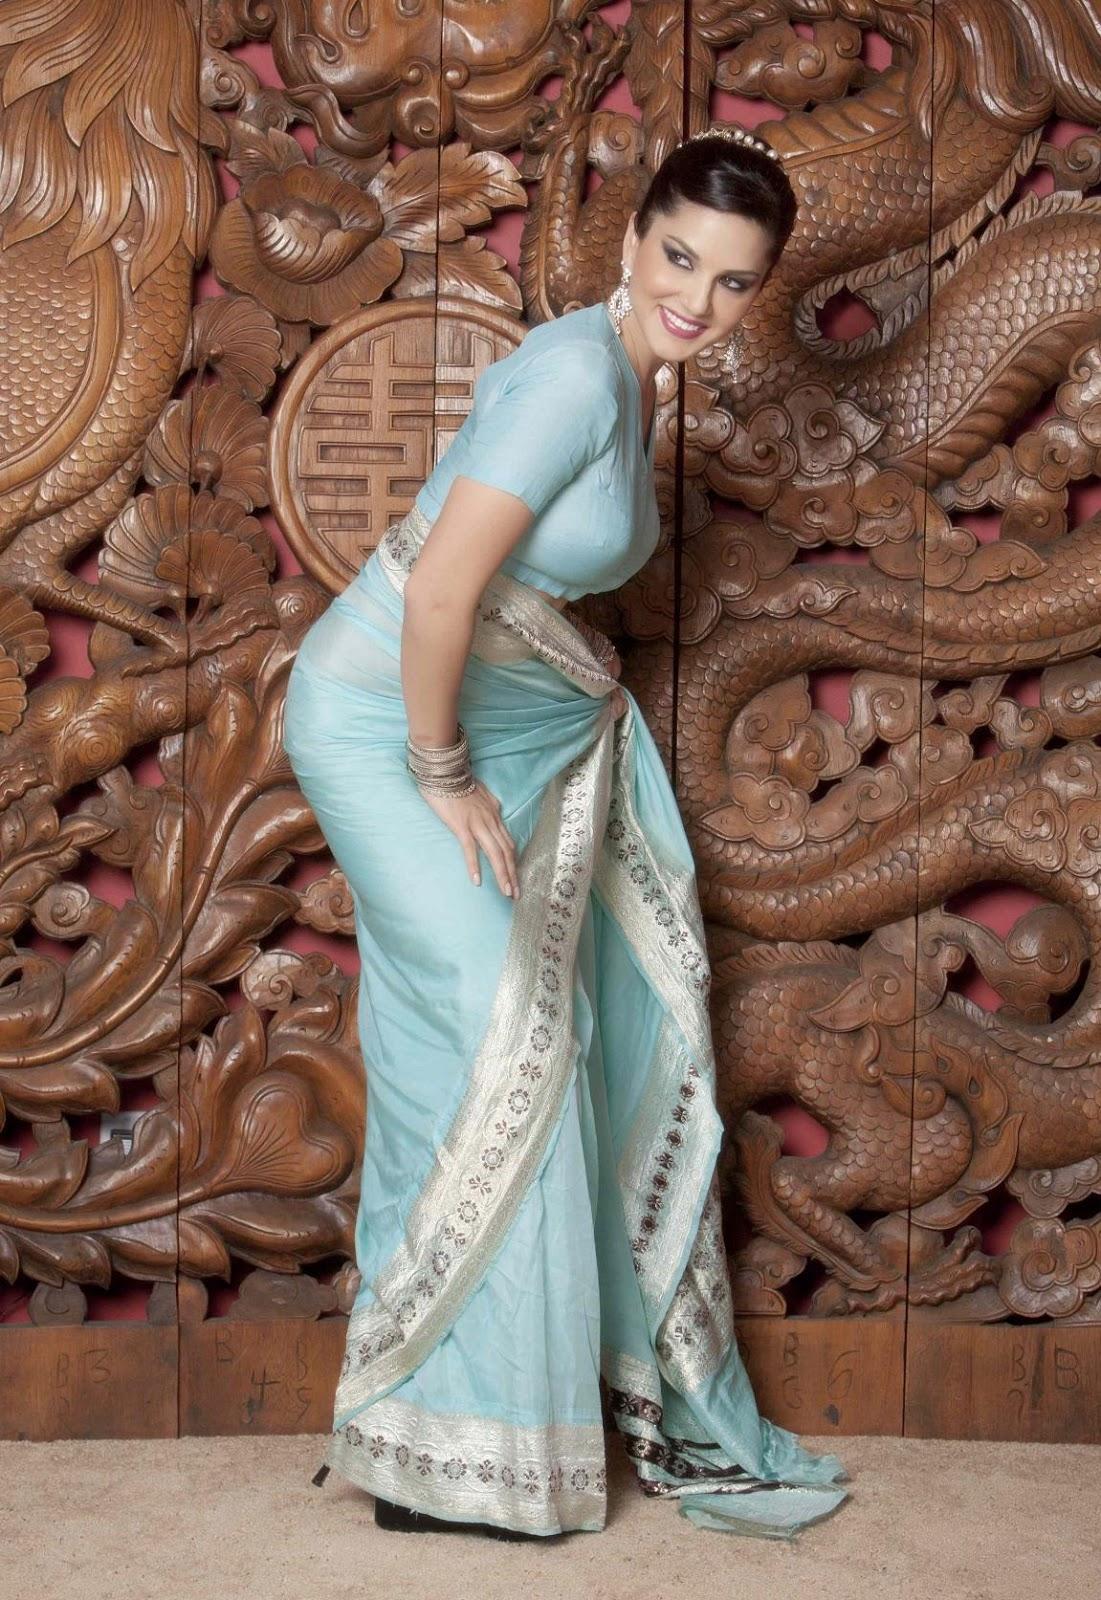 Saree Wali Girl Wallpaper Kashmira Shah Sunny Leone Looking Hot In Blue Saree